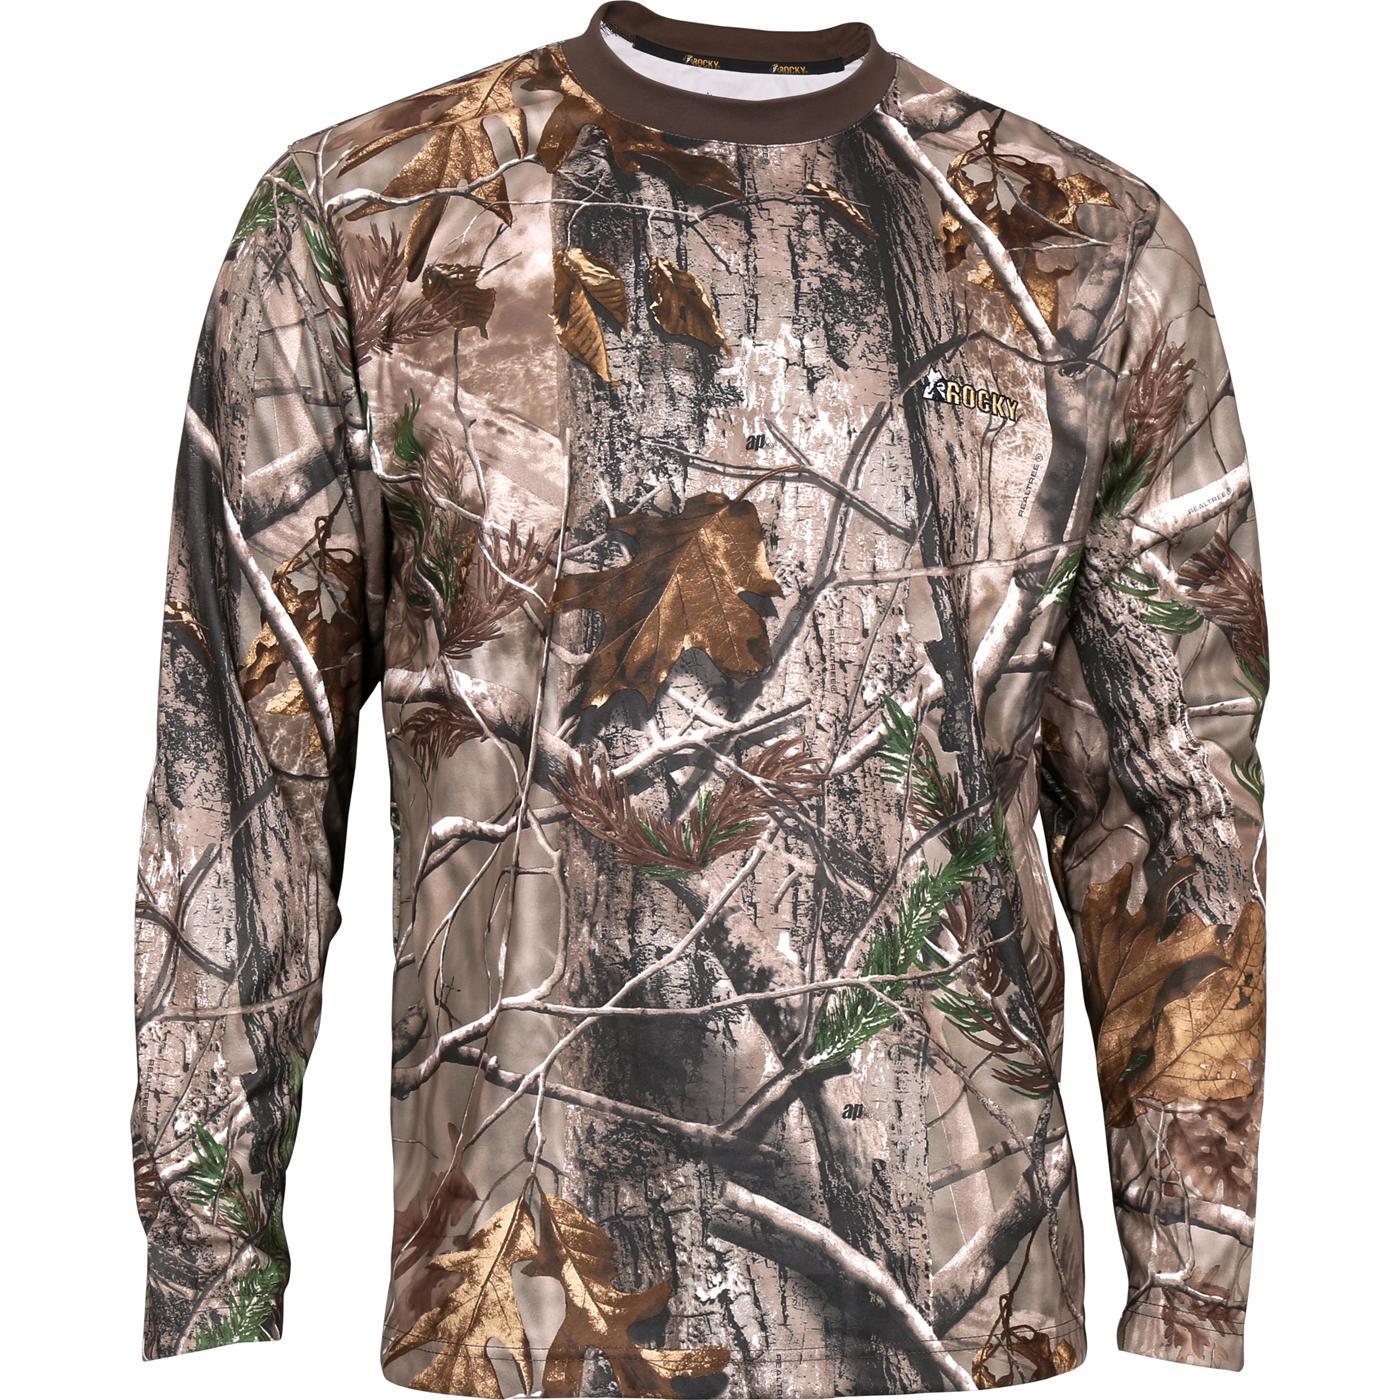 e0776ded4bbcc Rocky SilentHunter Long-Sleeve Performance Shirt, Realtree AP, large